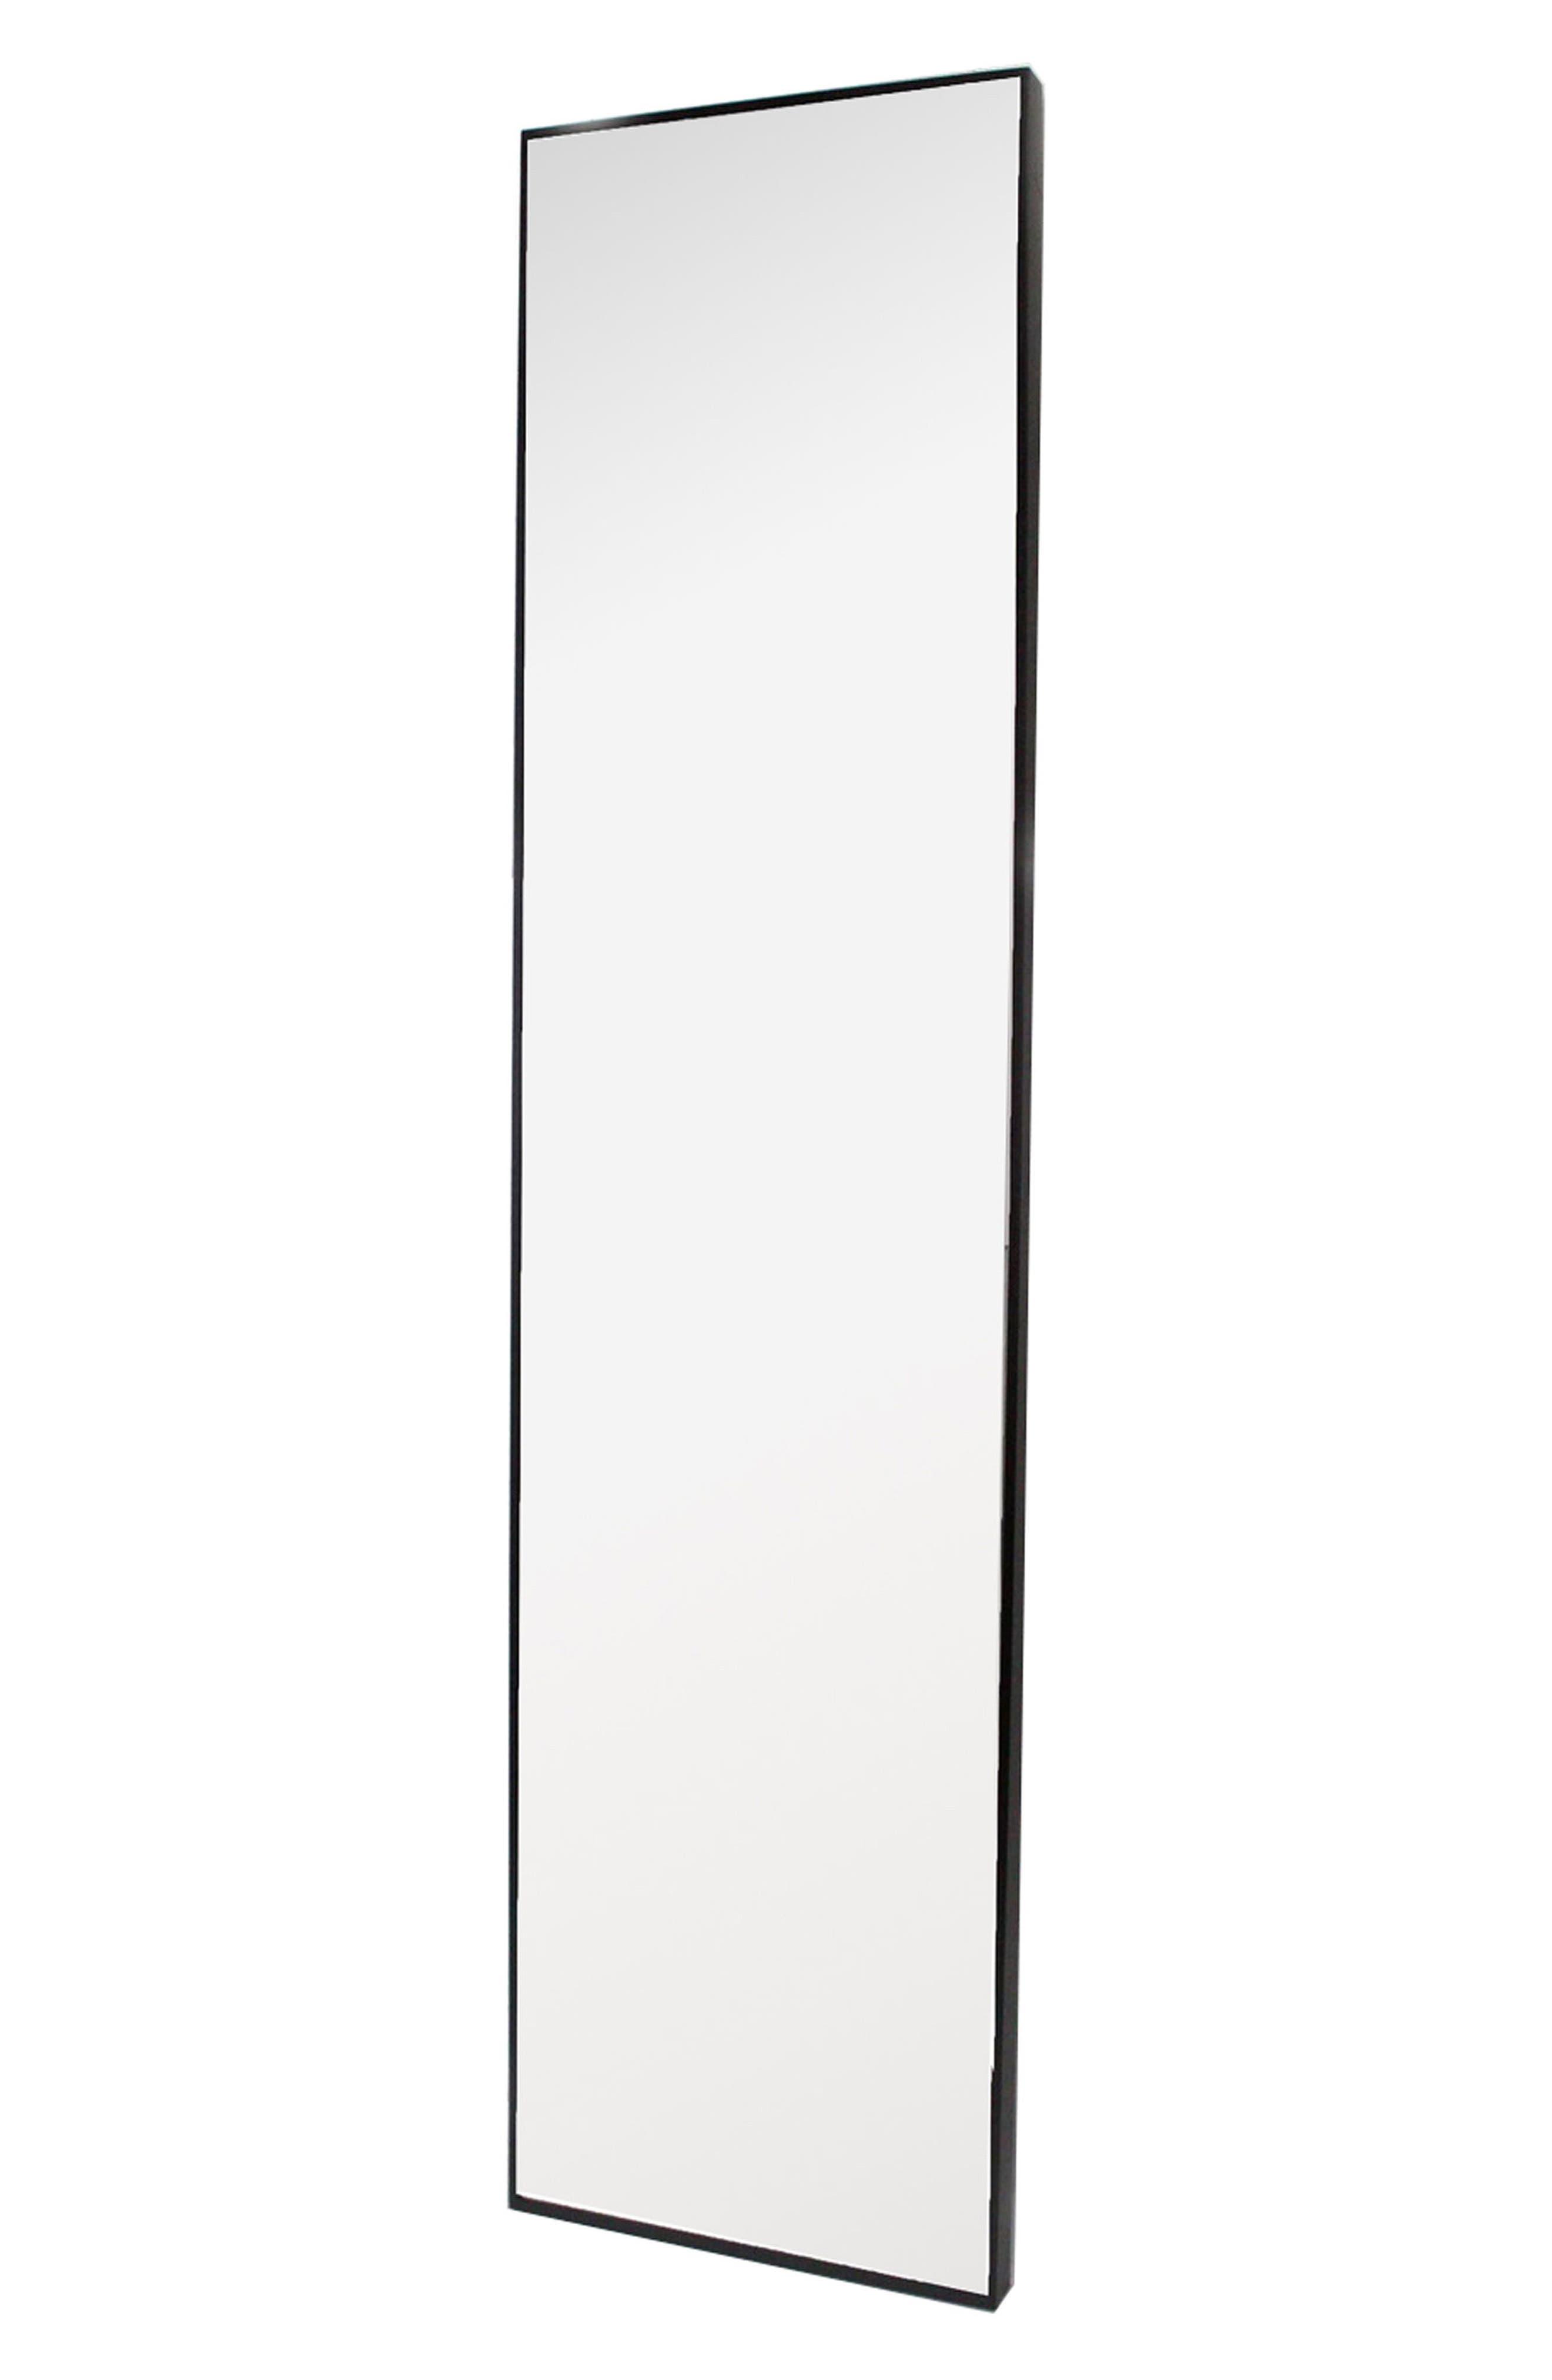 Crystal Art Gallery Wood Wall Mirror